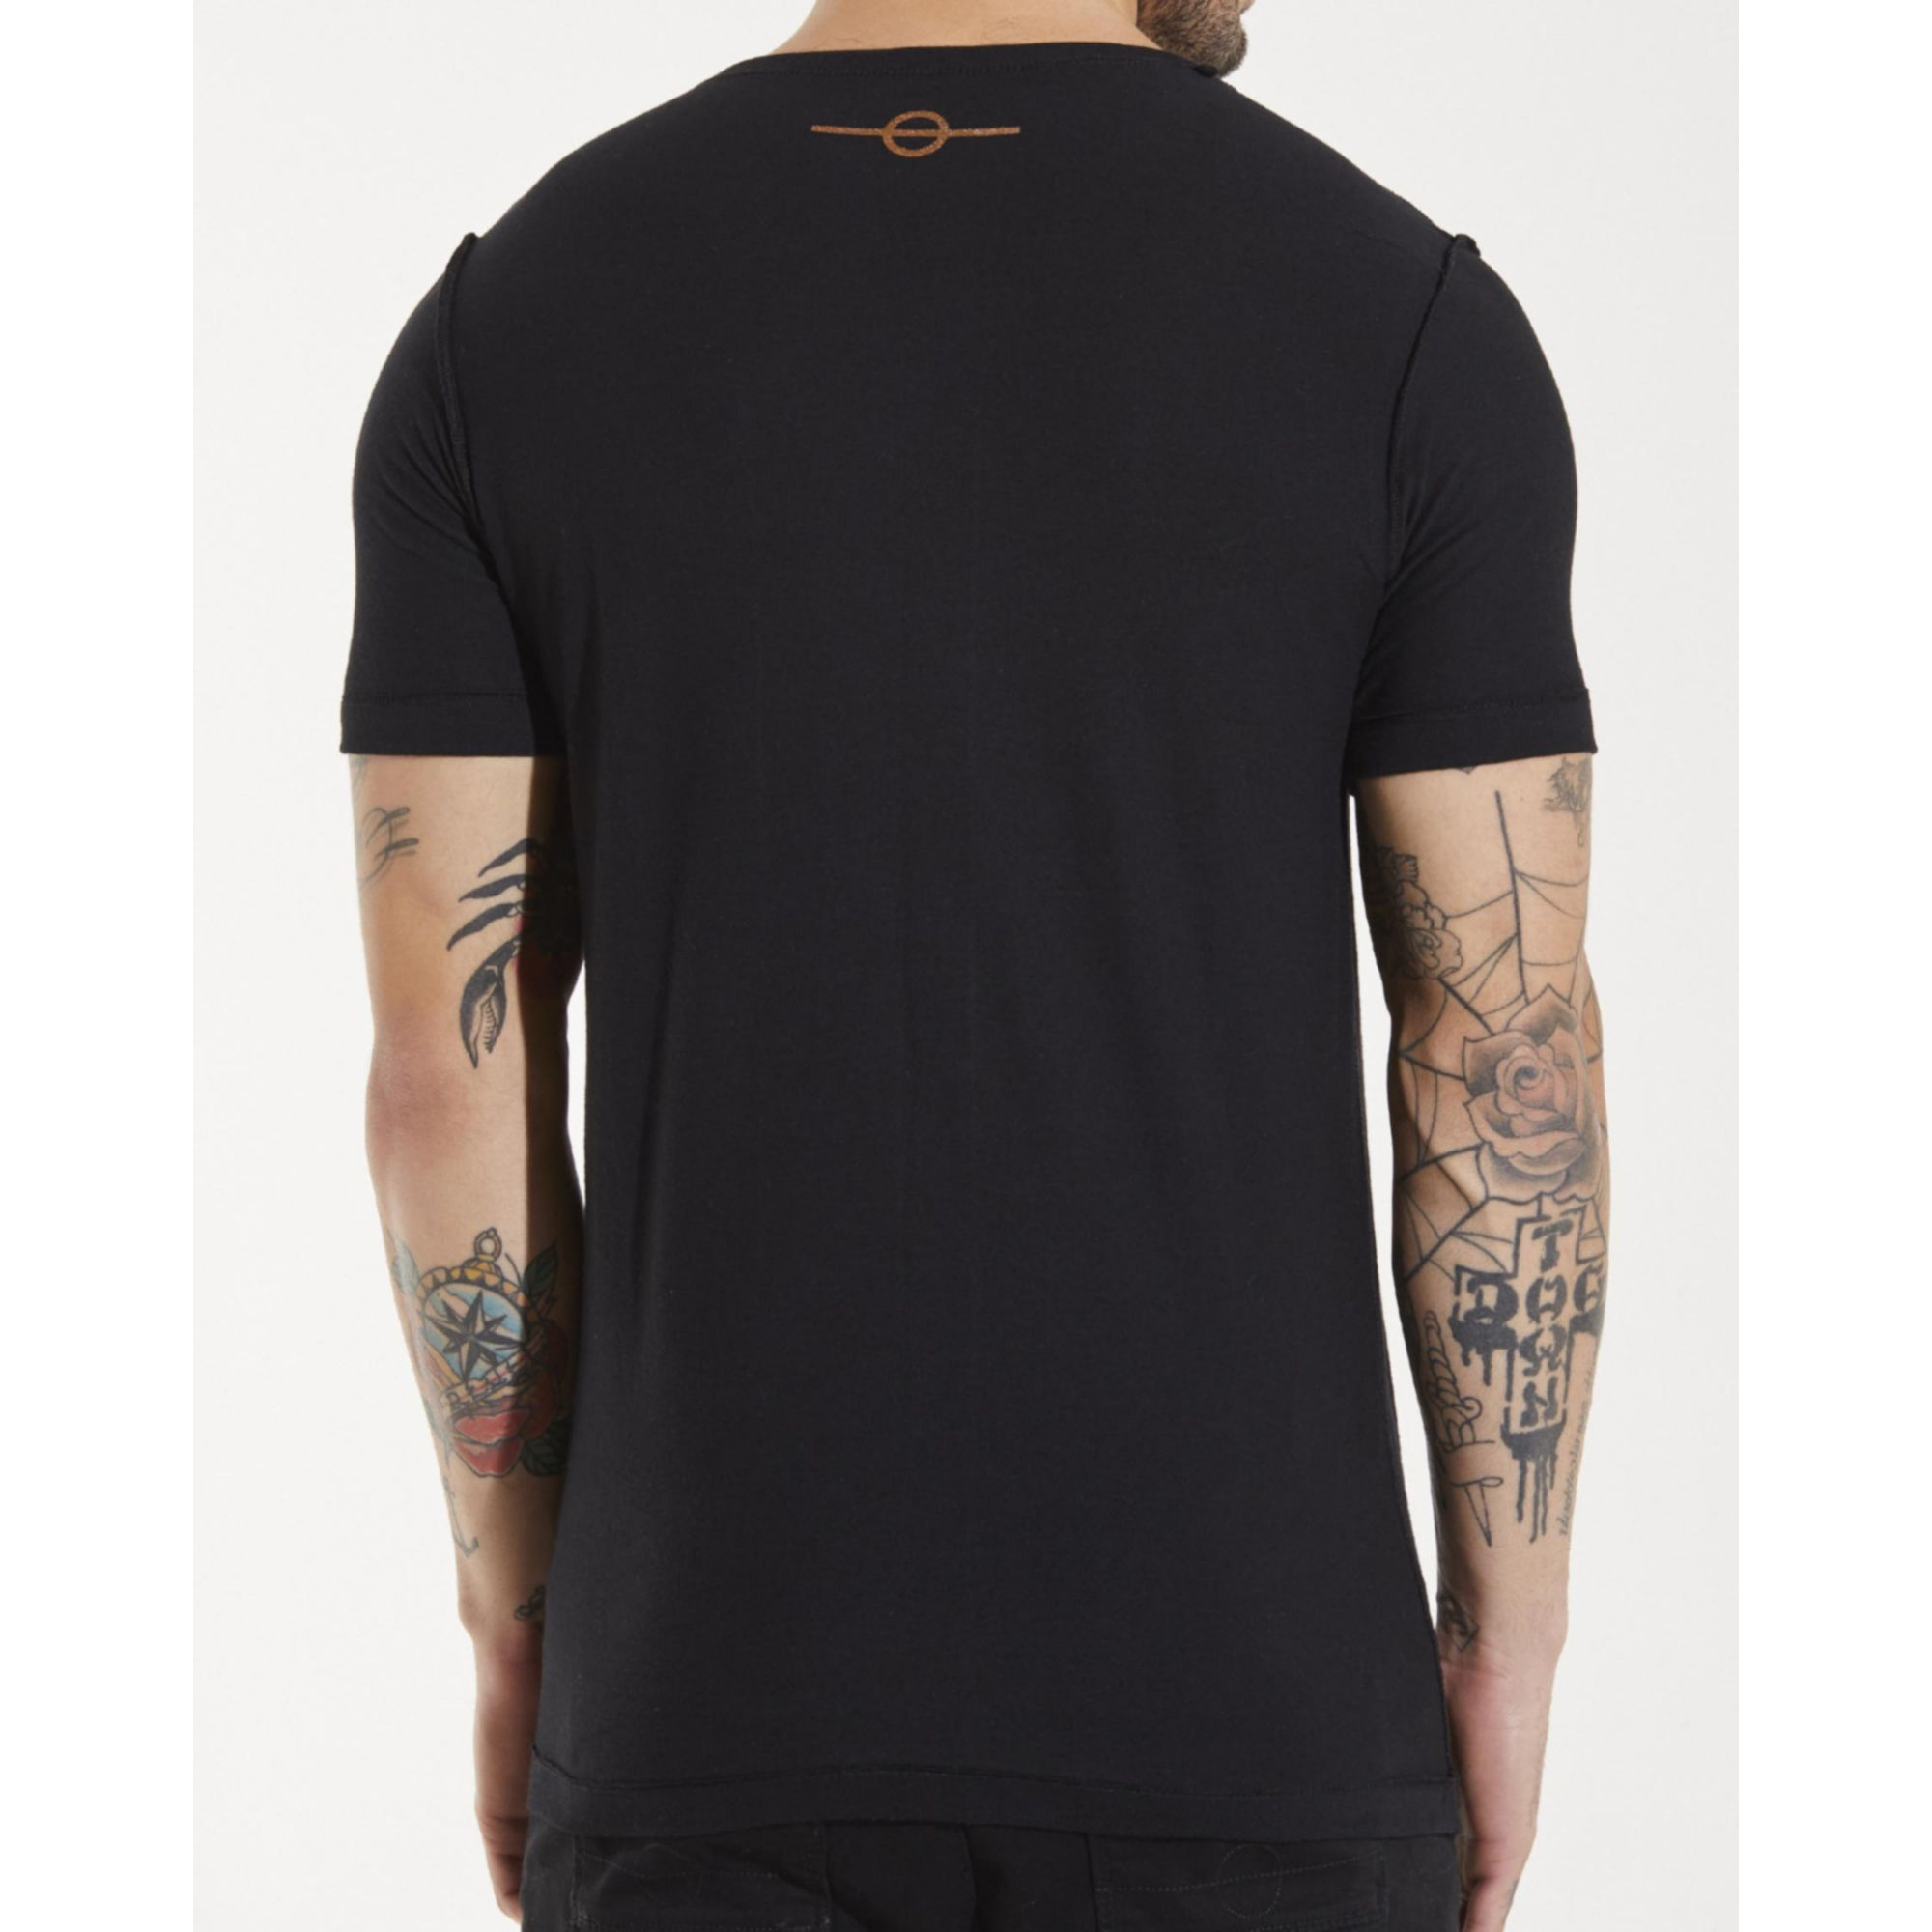 Camiseta Buh Dupla Face Foil Black